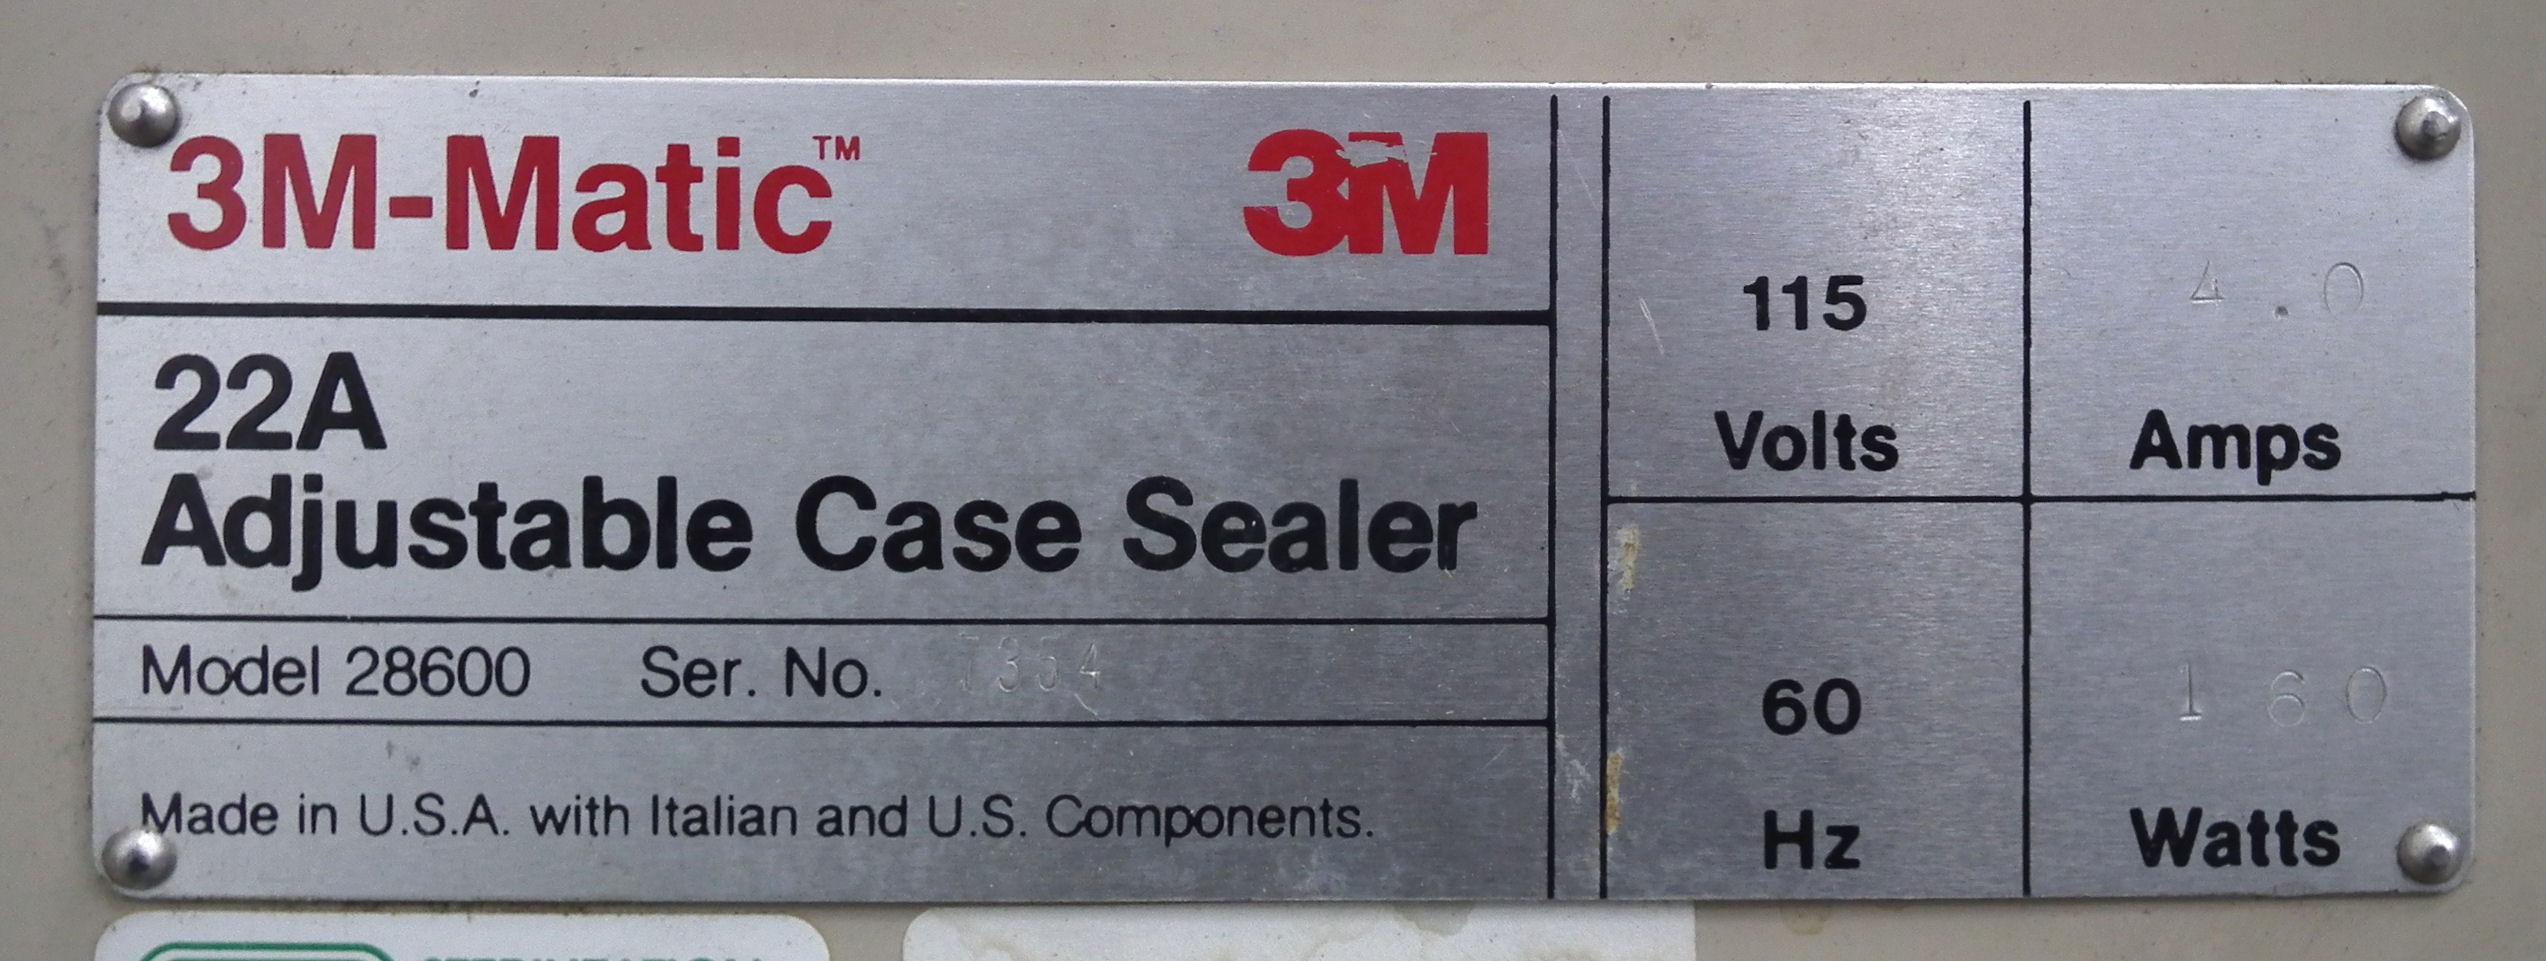 3M 22A Adjustable Case Sealer Type 28600 A7997 - Image 6 of 6